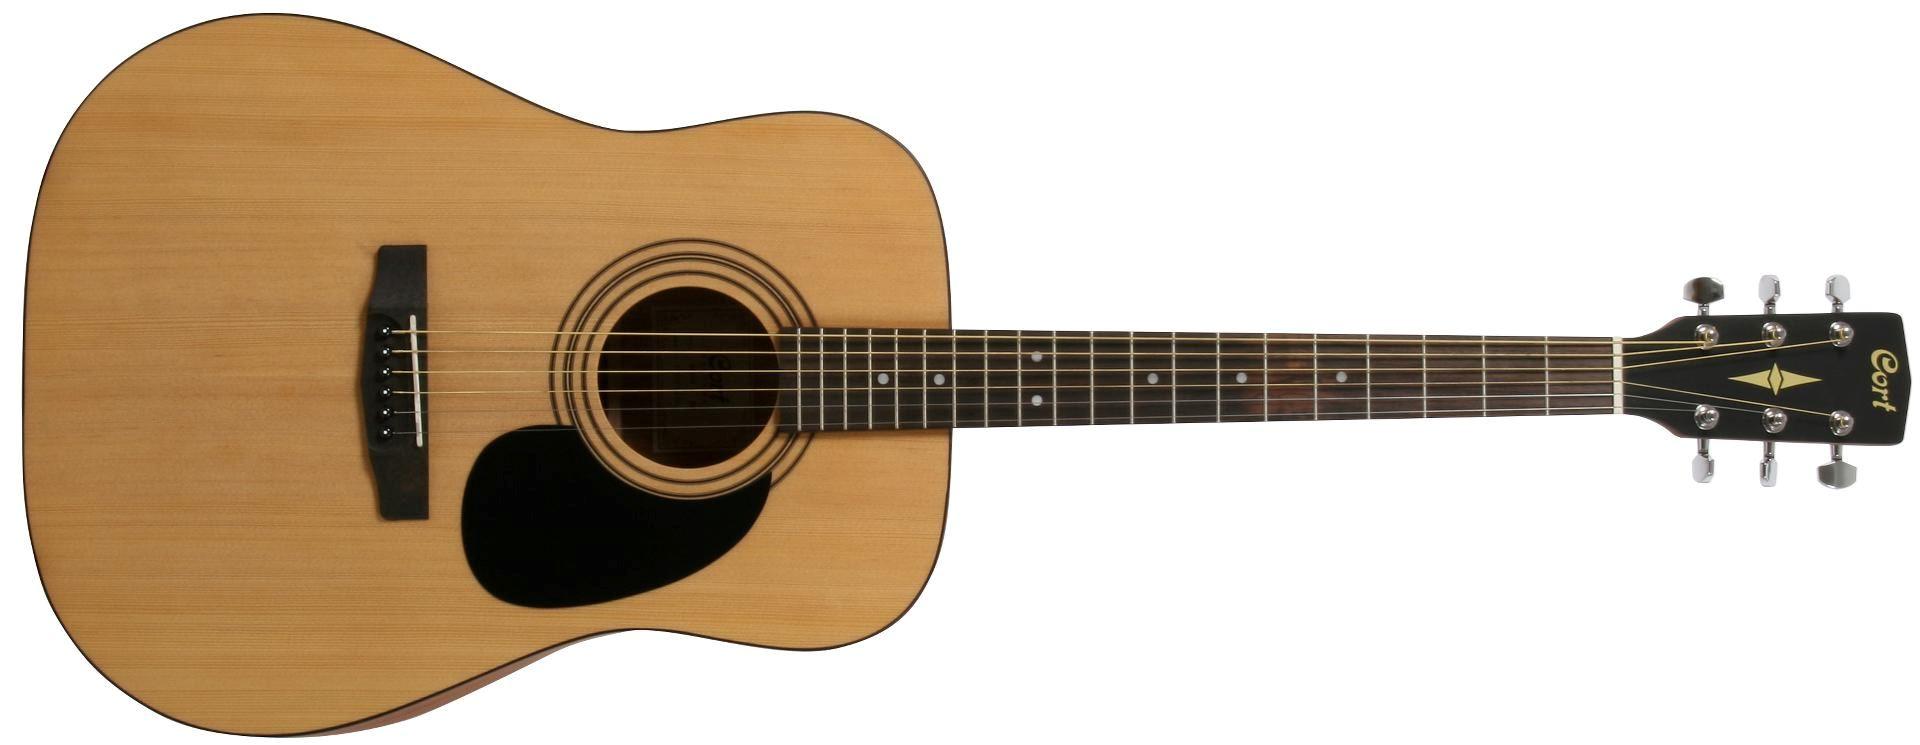 acoustic guitar, guitar lessons